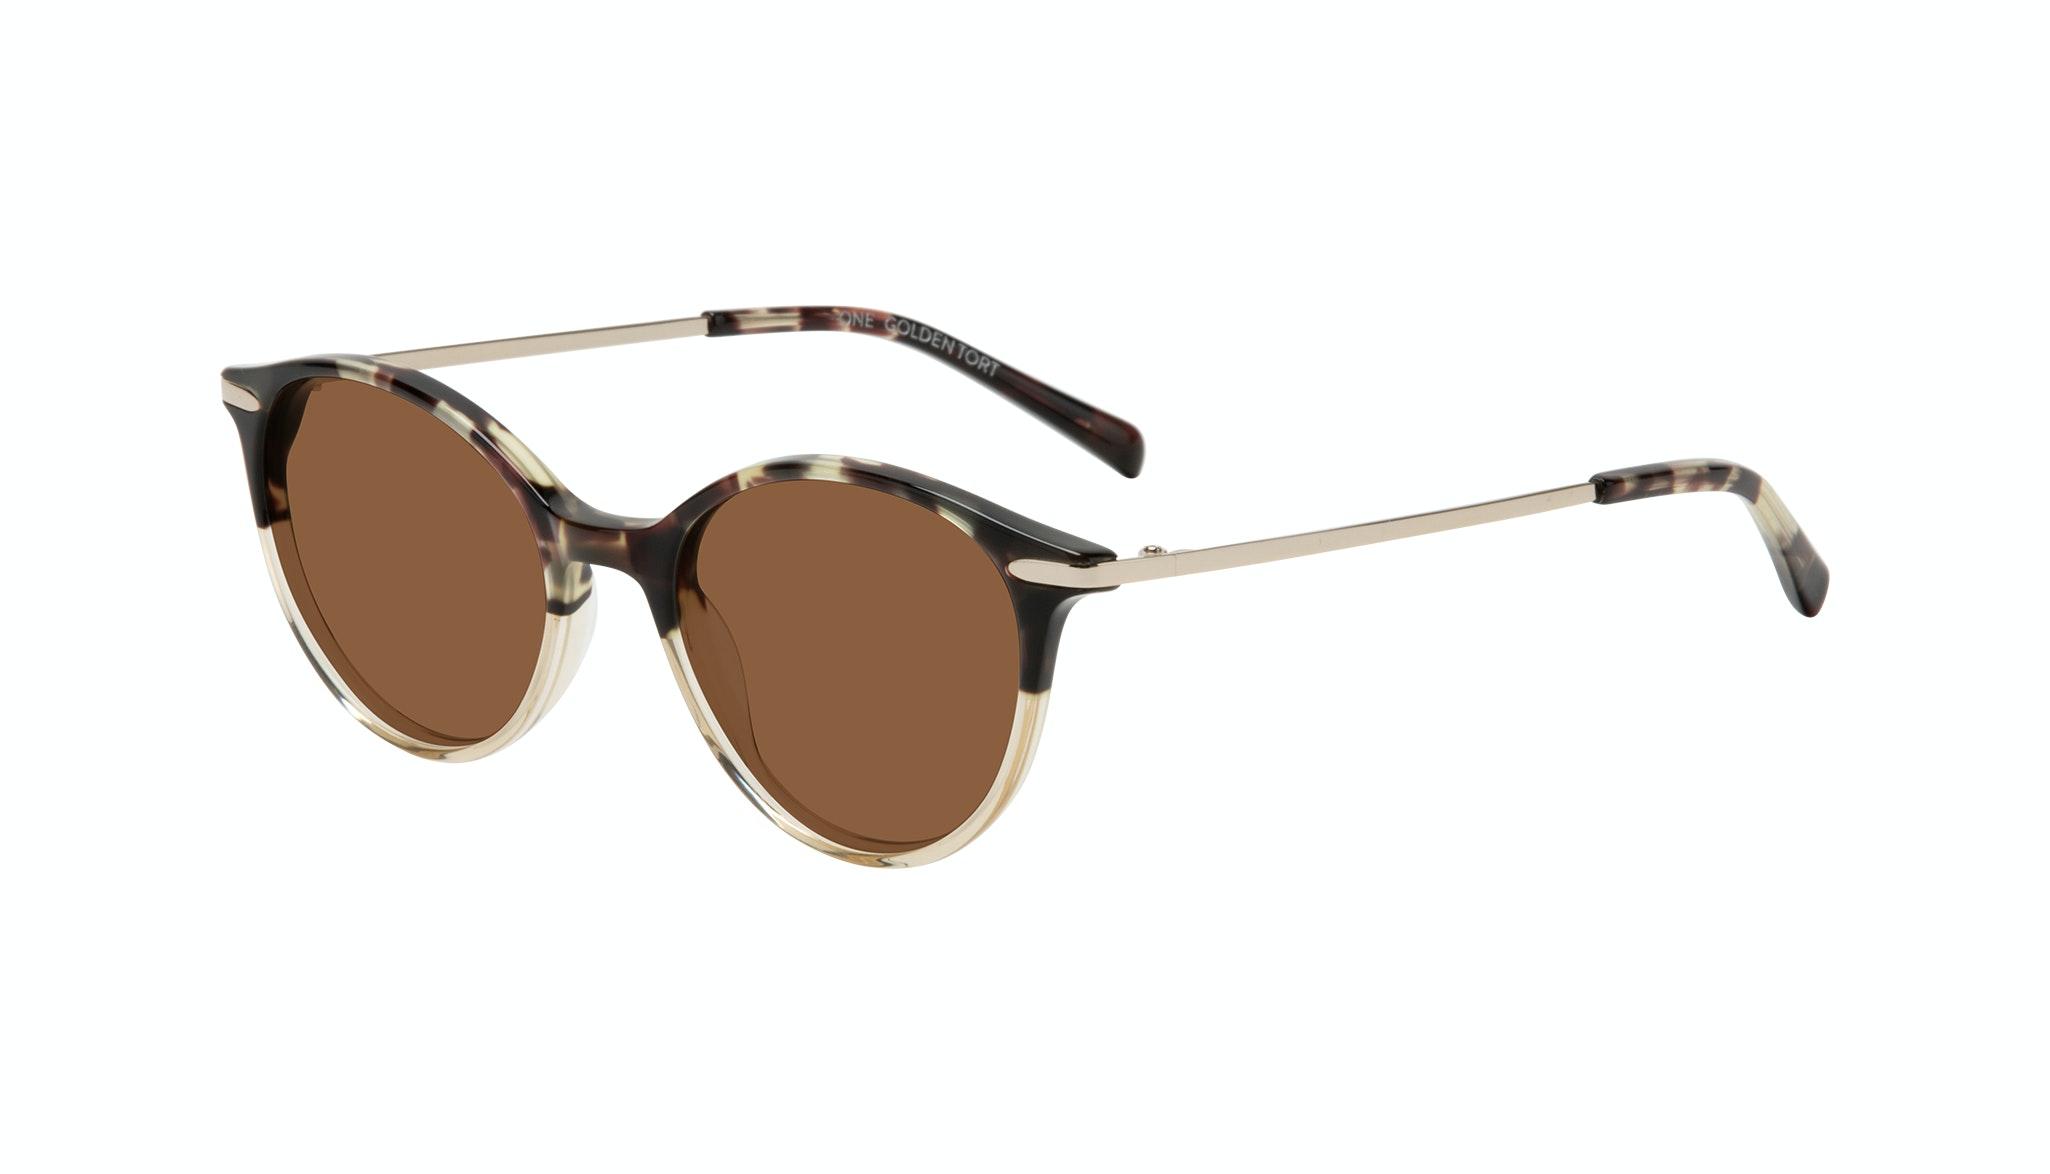 Affordable Fashion Glasses Round Sunglasses Women One Golden Tort Tilt